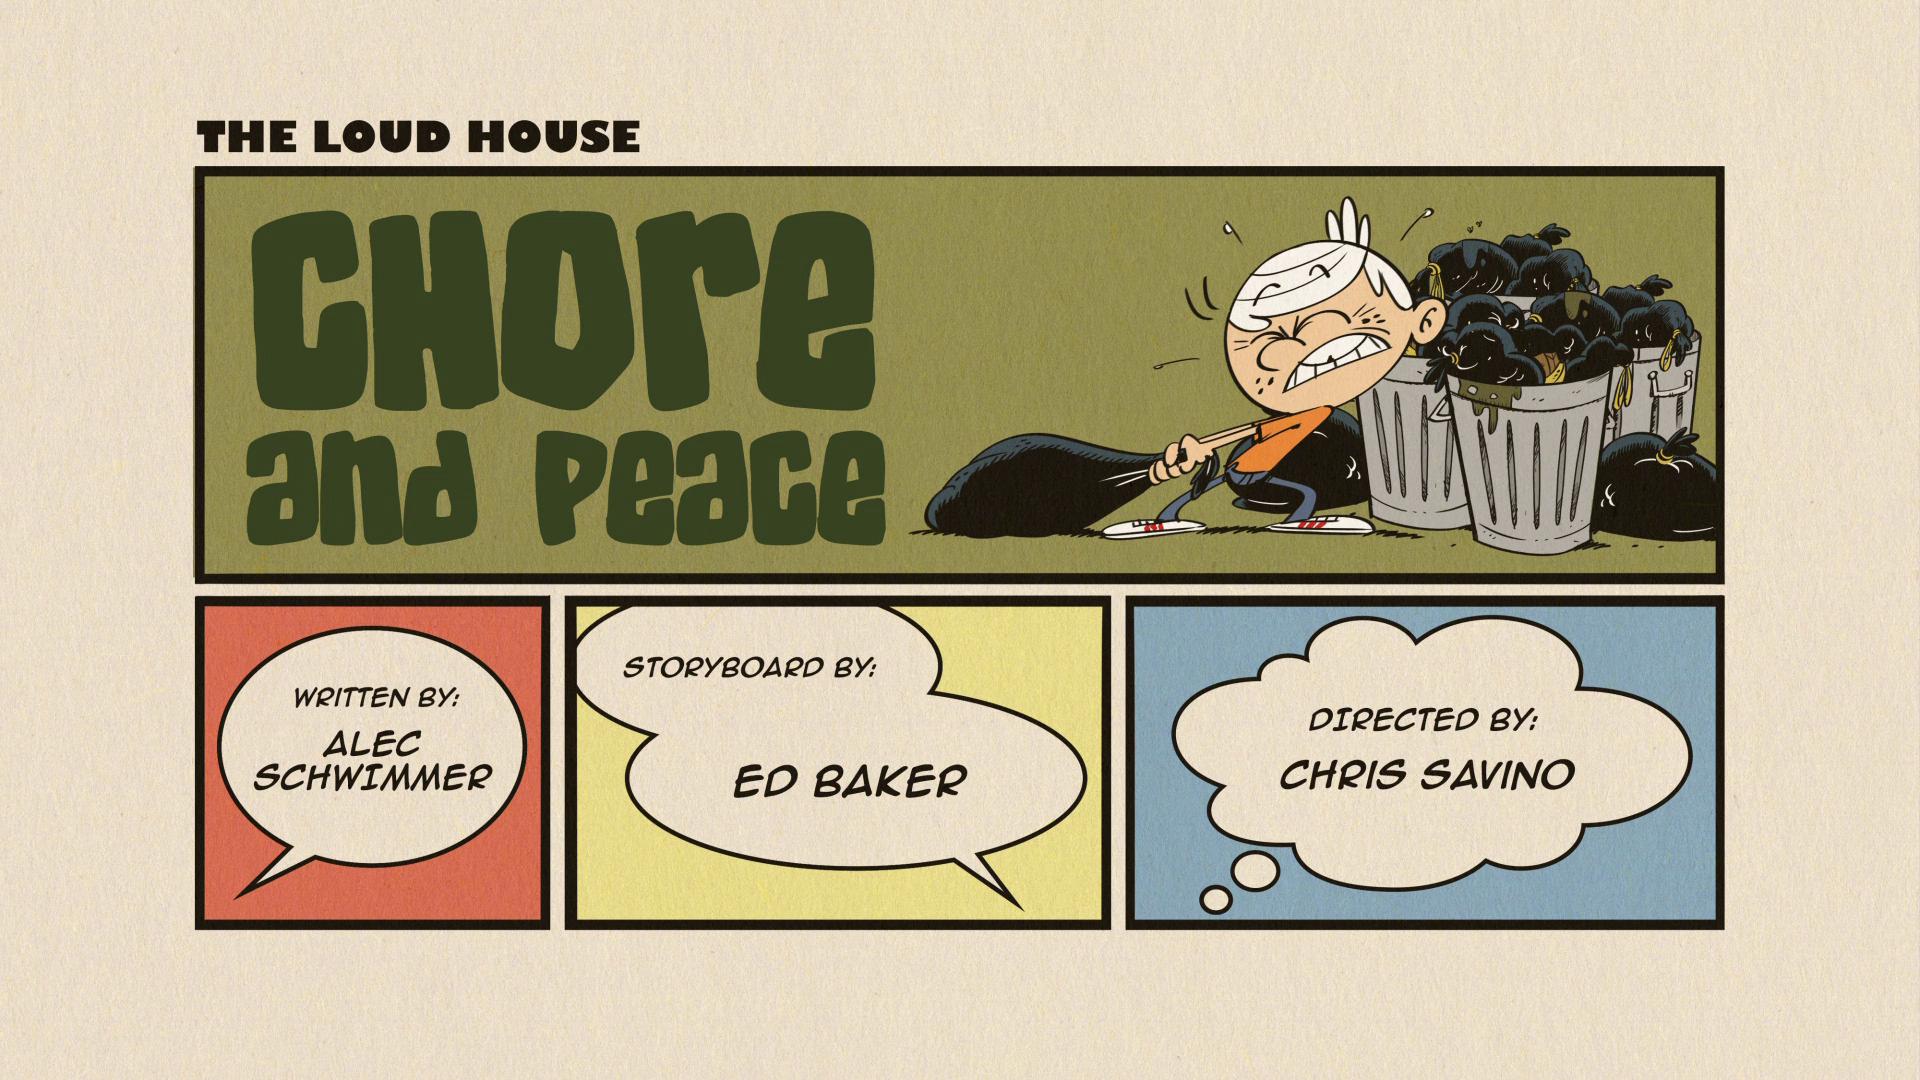 Chore and Peace